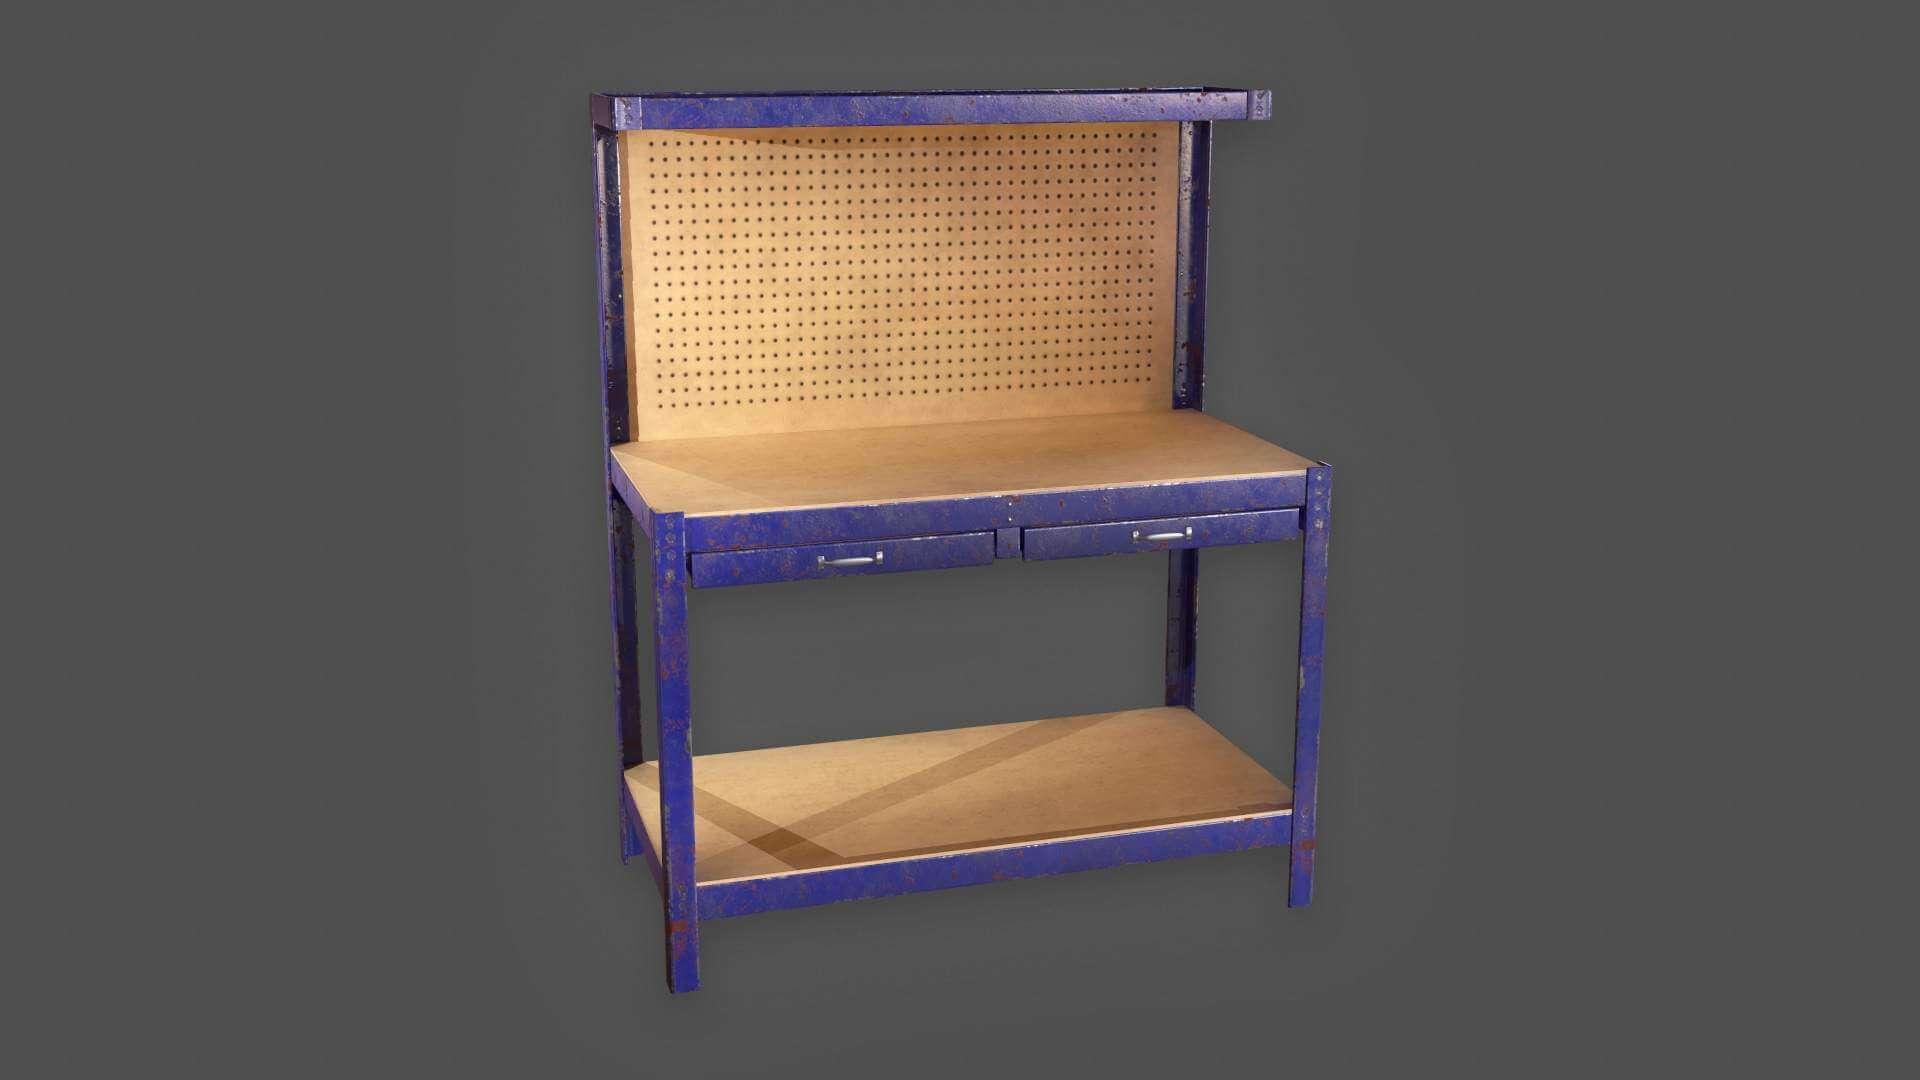 Swell Work Bench 3D Model Evergreenethics Interior Chair Design Evergreenethicsorg